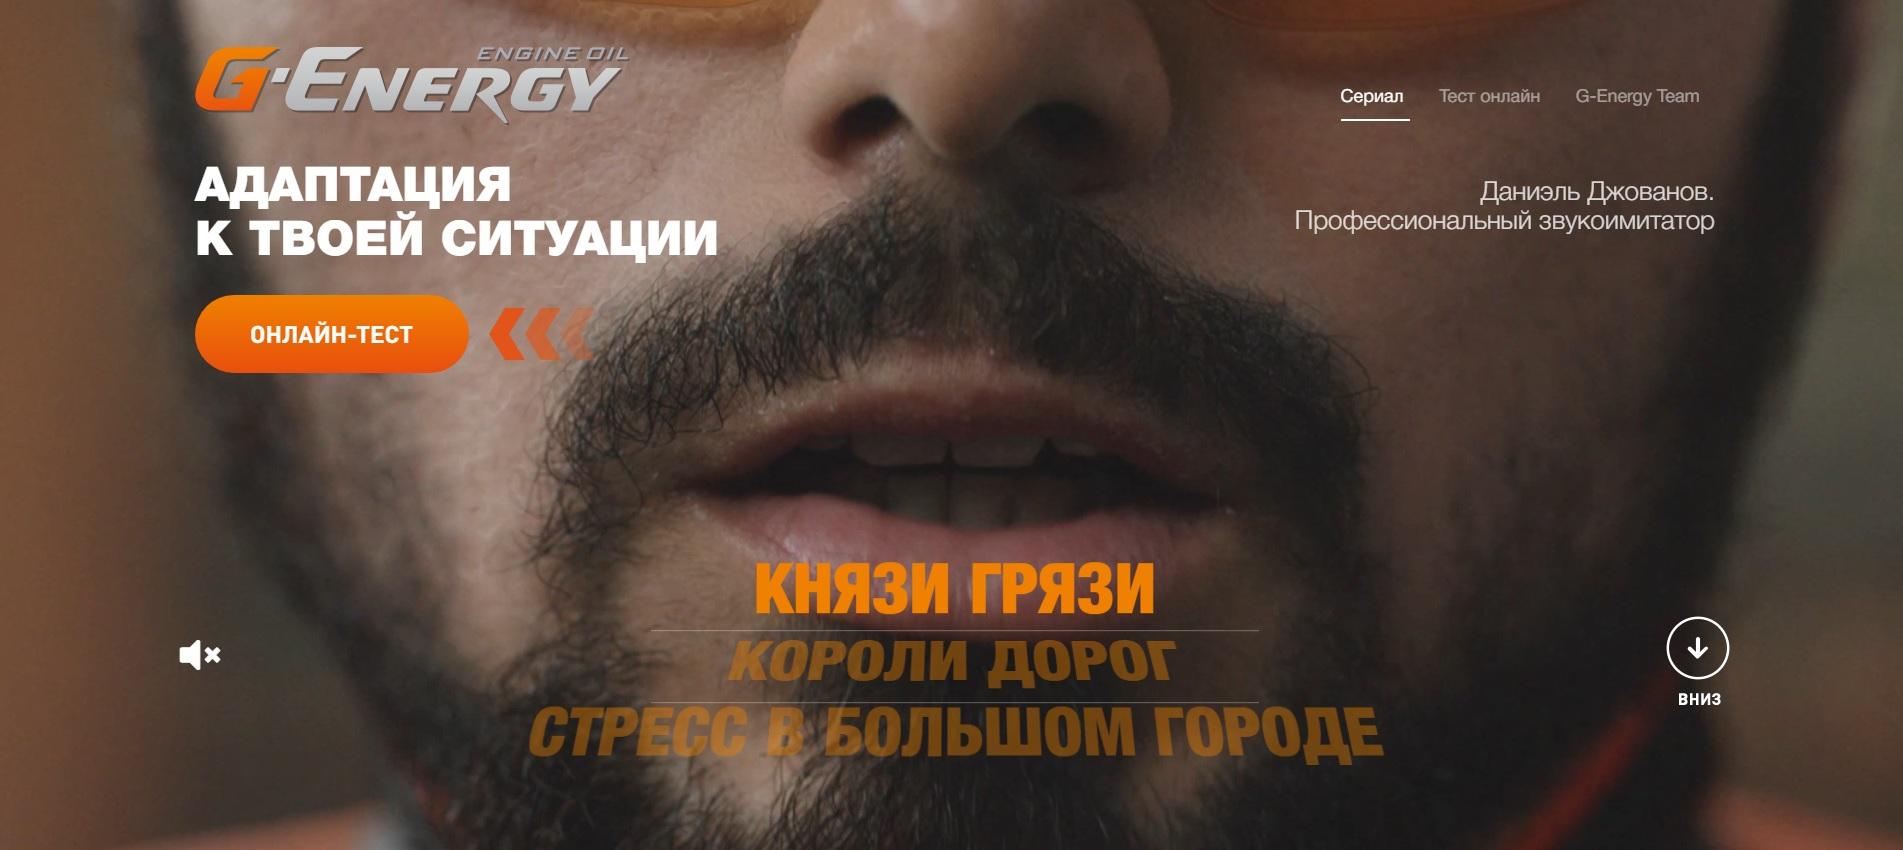 www.adaptation.g-energy.org акция 2019 года